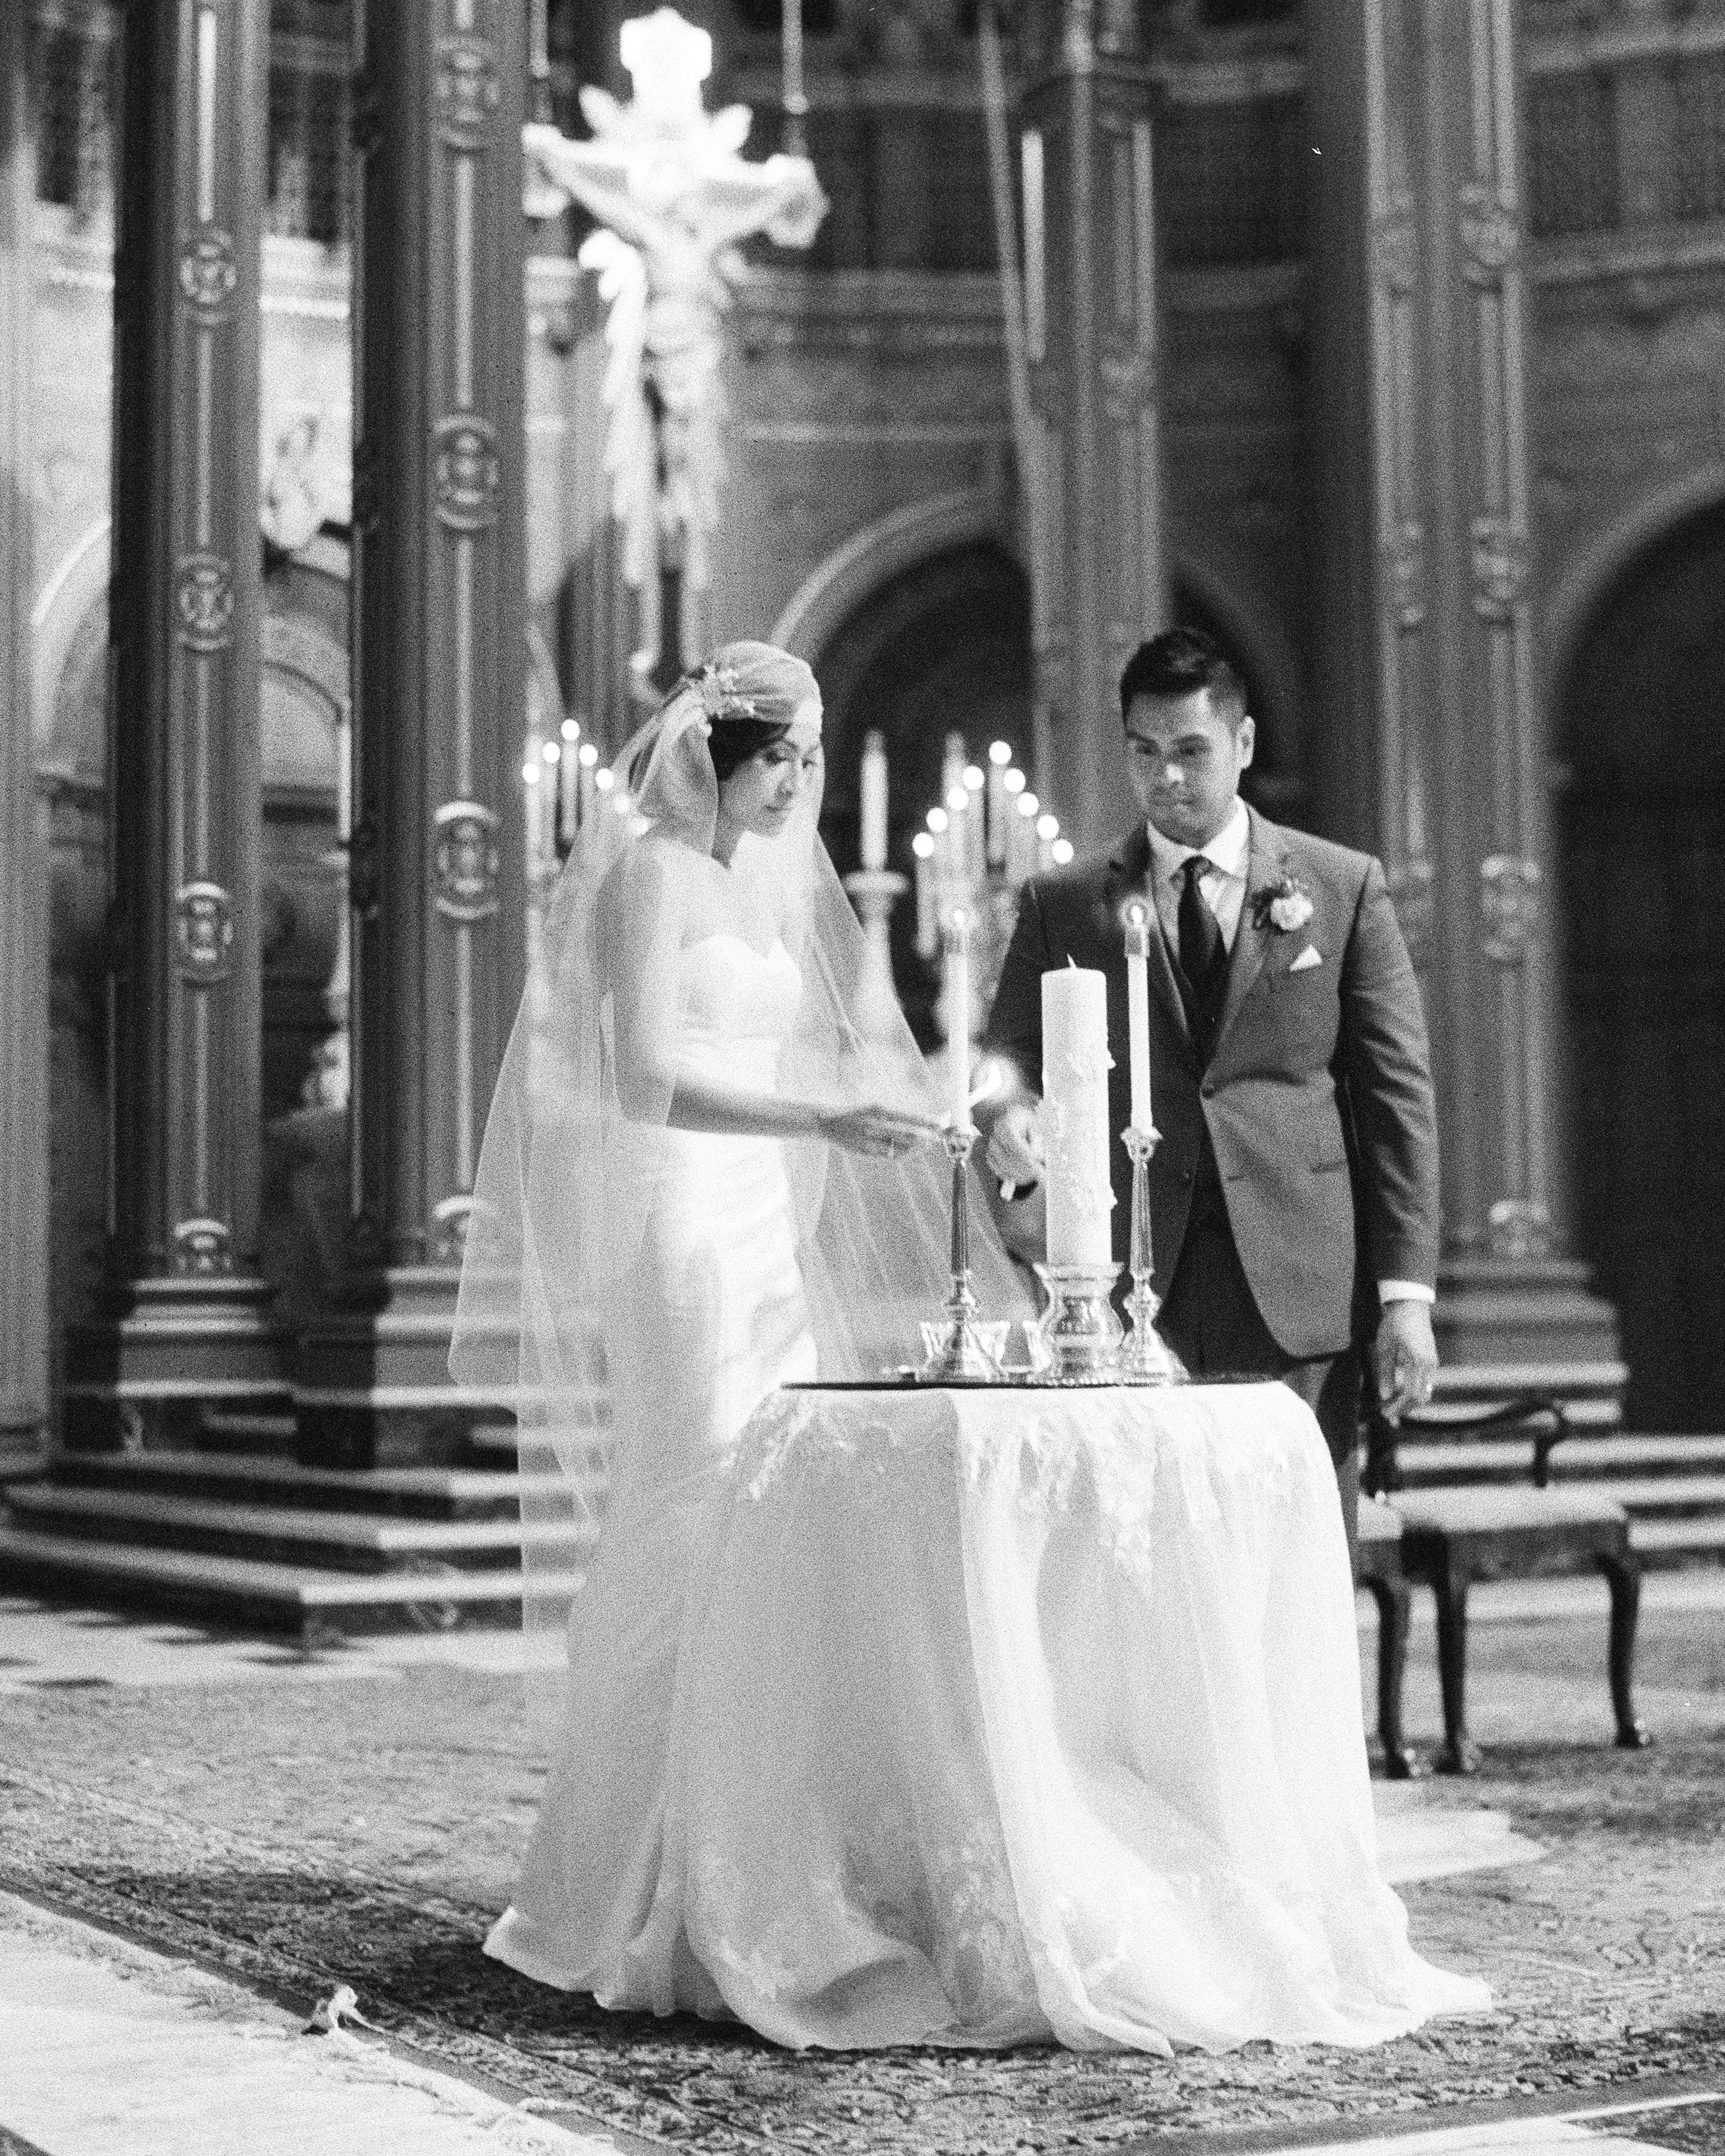 marianne-ian-wedding-couple-church-0414.jpg